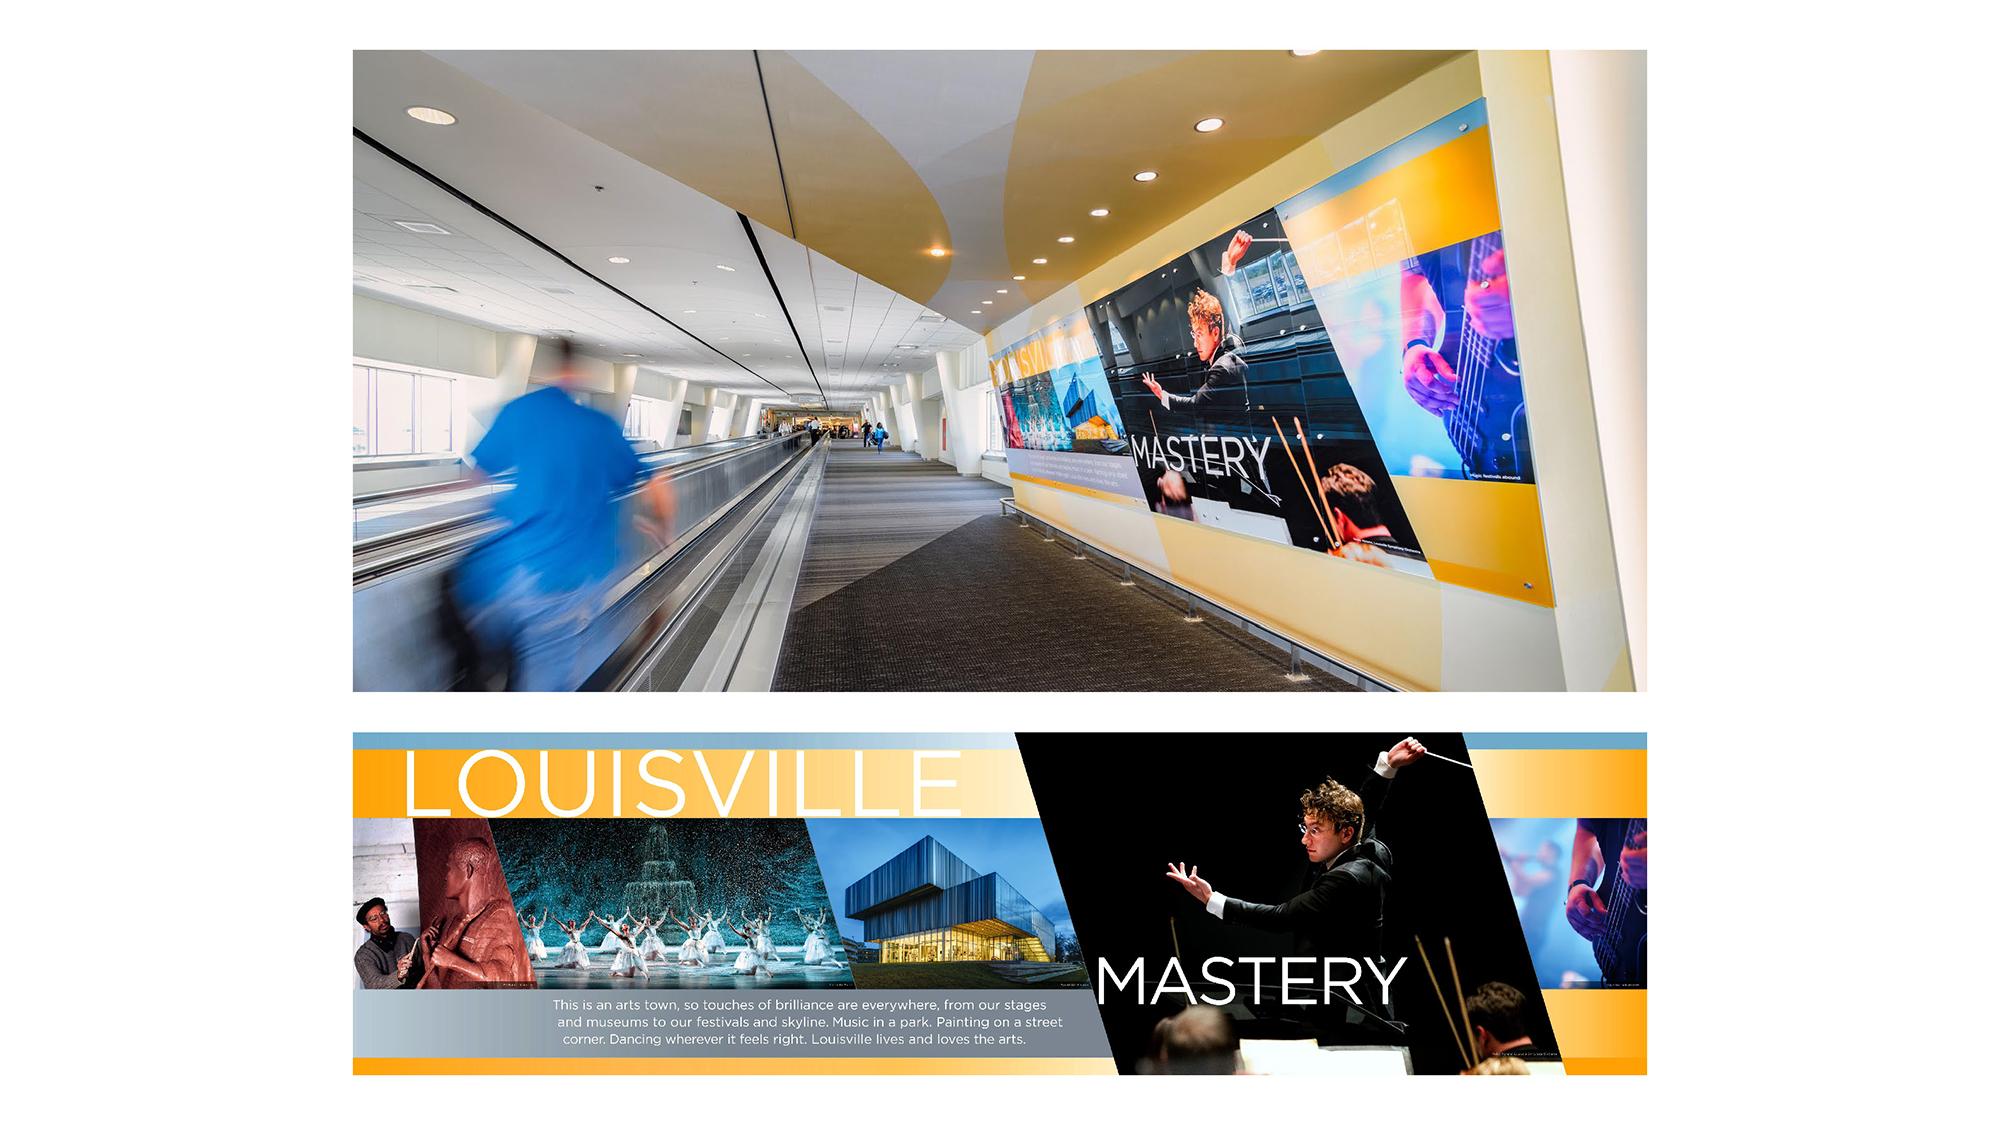 Louisville Airport-02.jpg